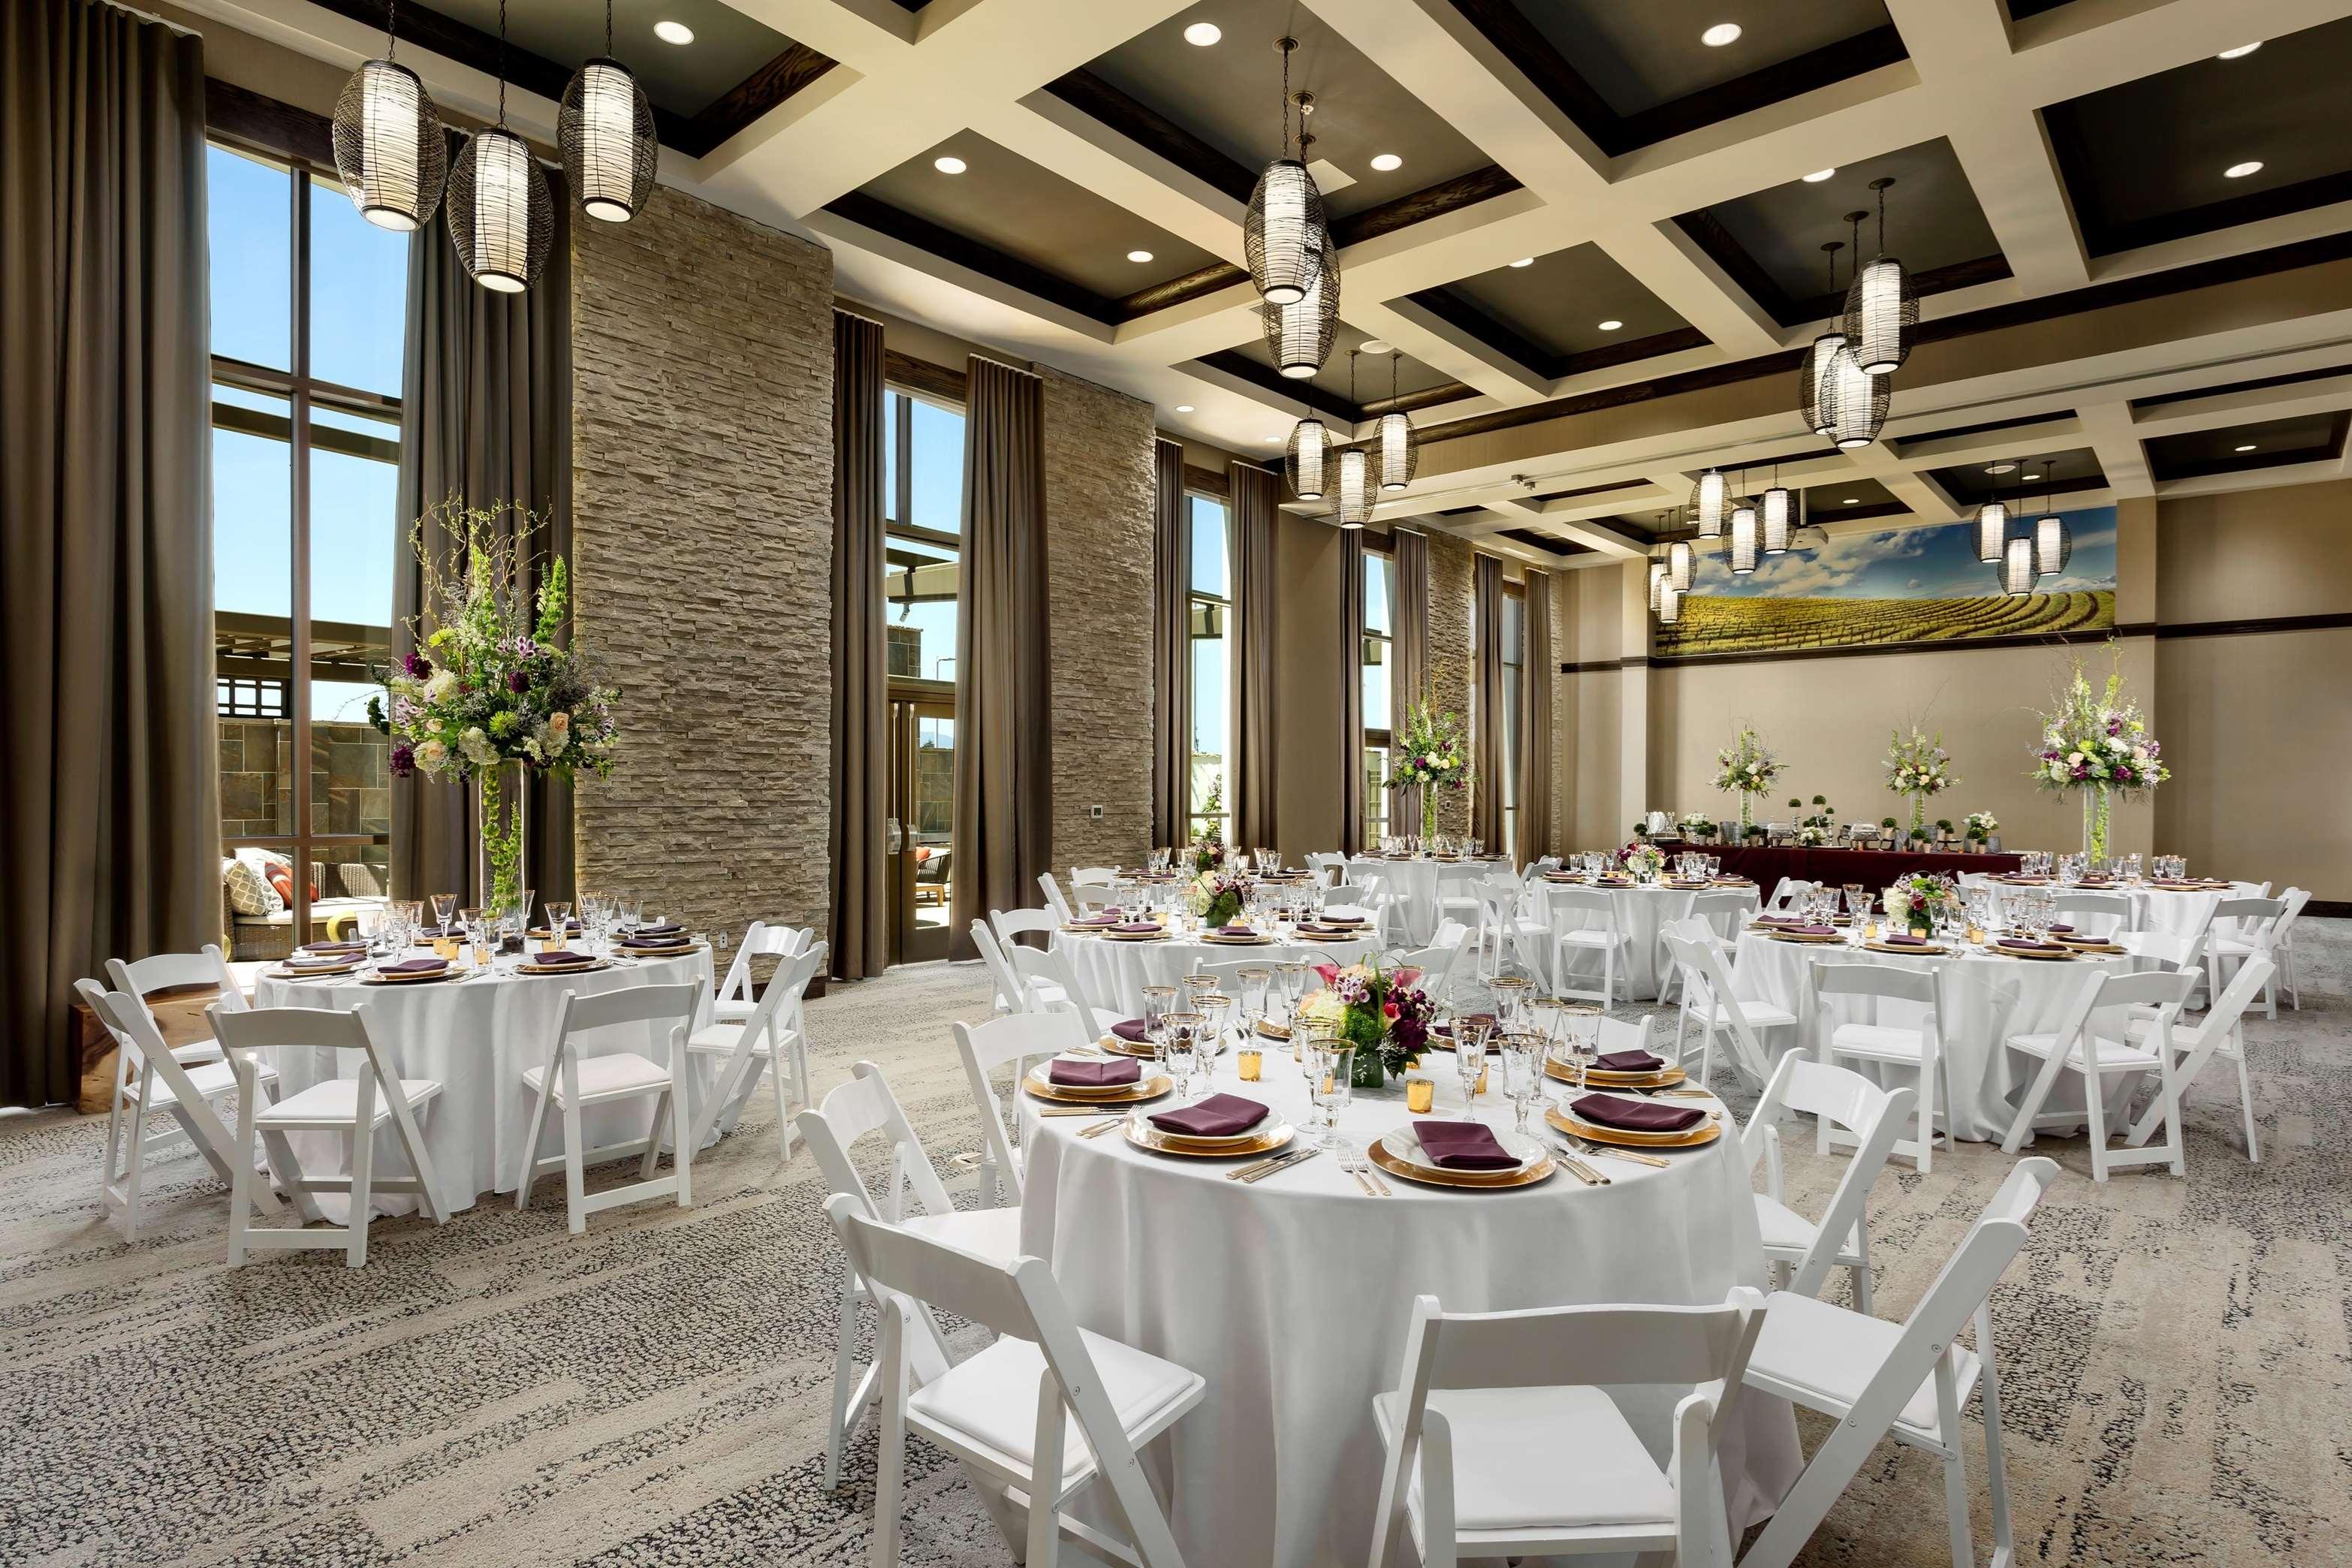 Hampton Inn & Suites Napa image 12